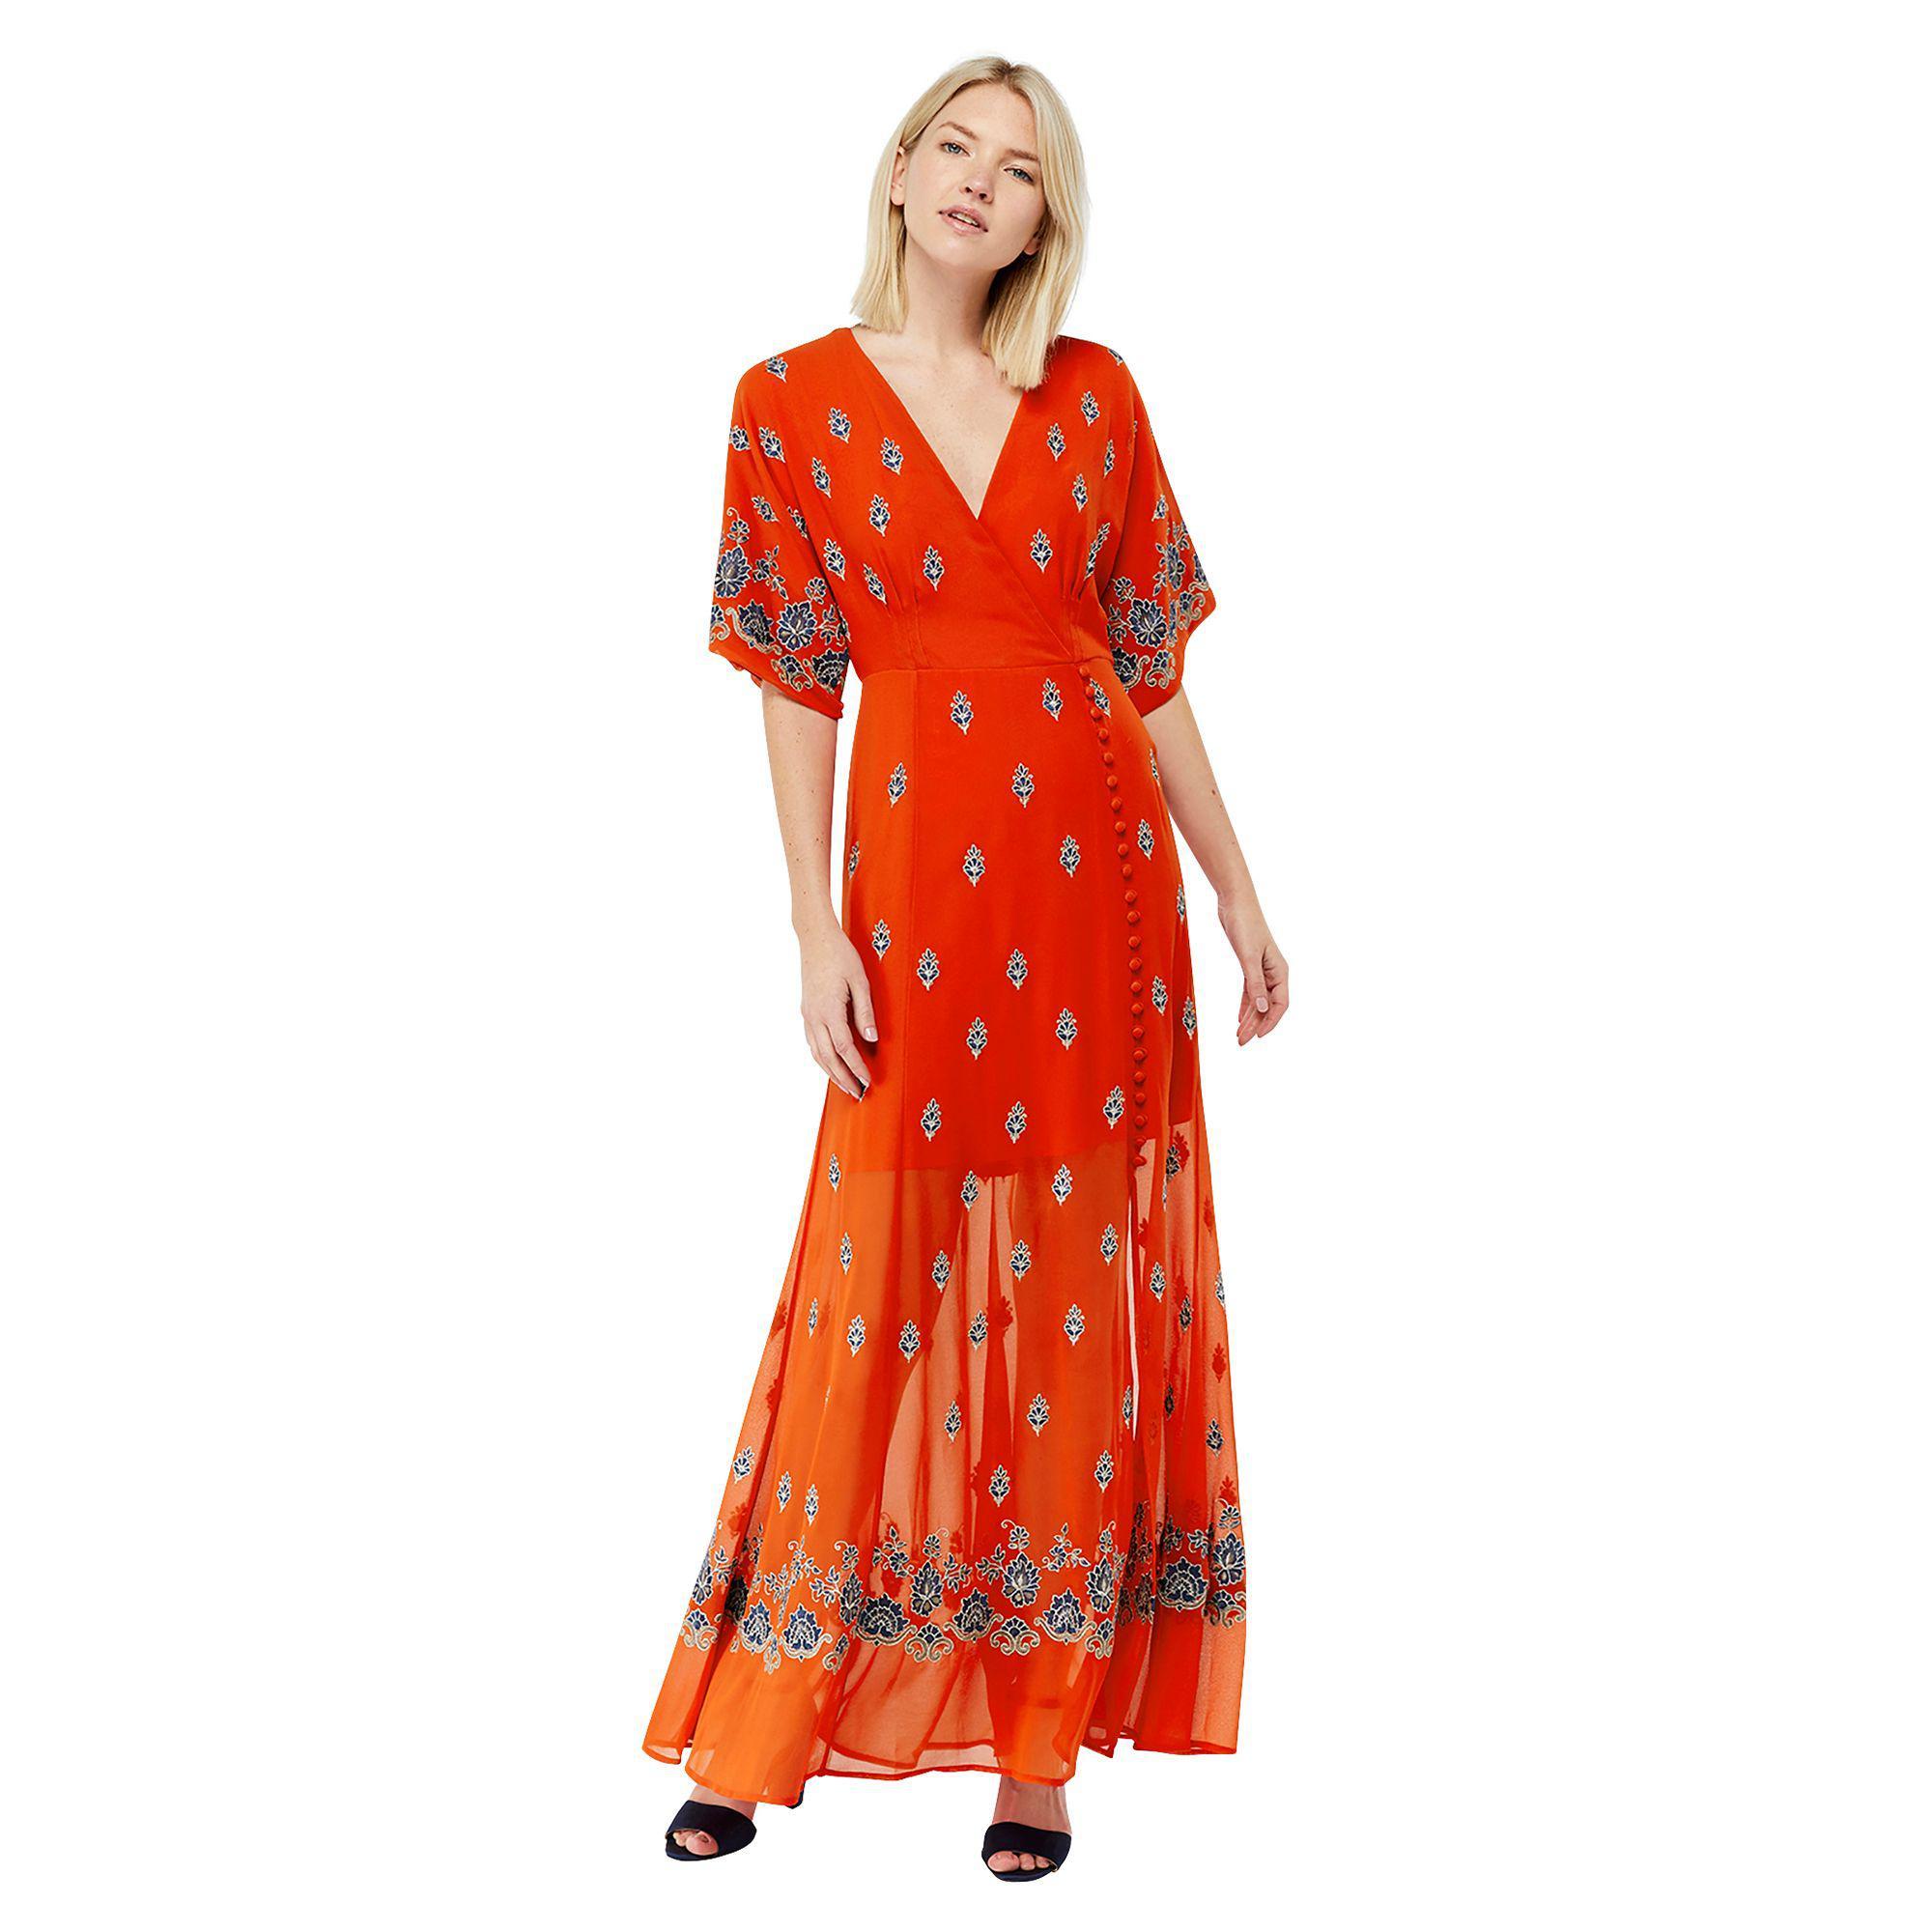 5dfe7fdb47a Monsoon Orange  ziggy  Embroidered Maxi Dress in Orange - Lyst